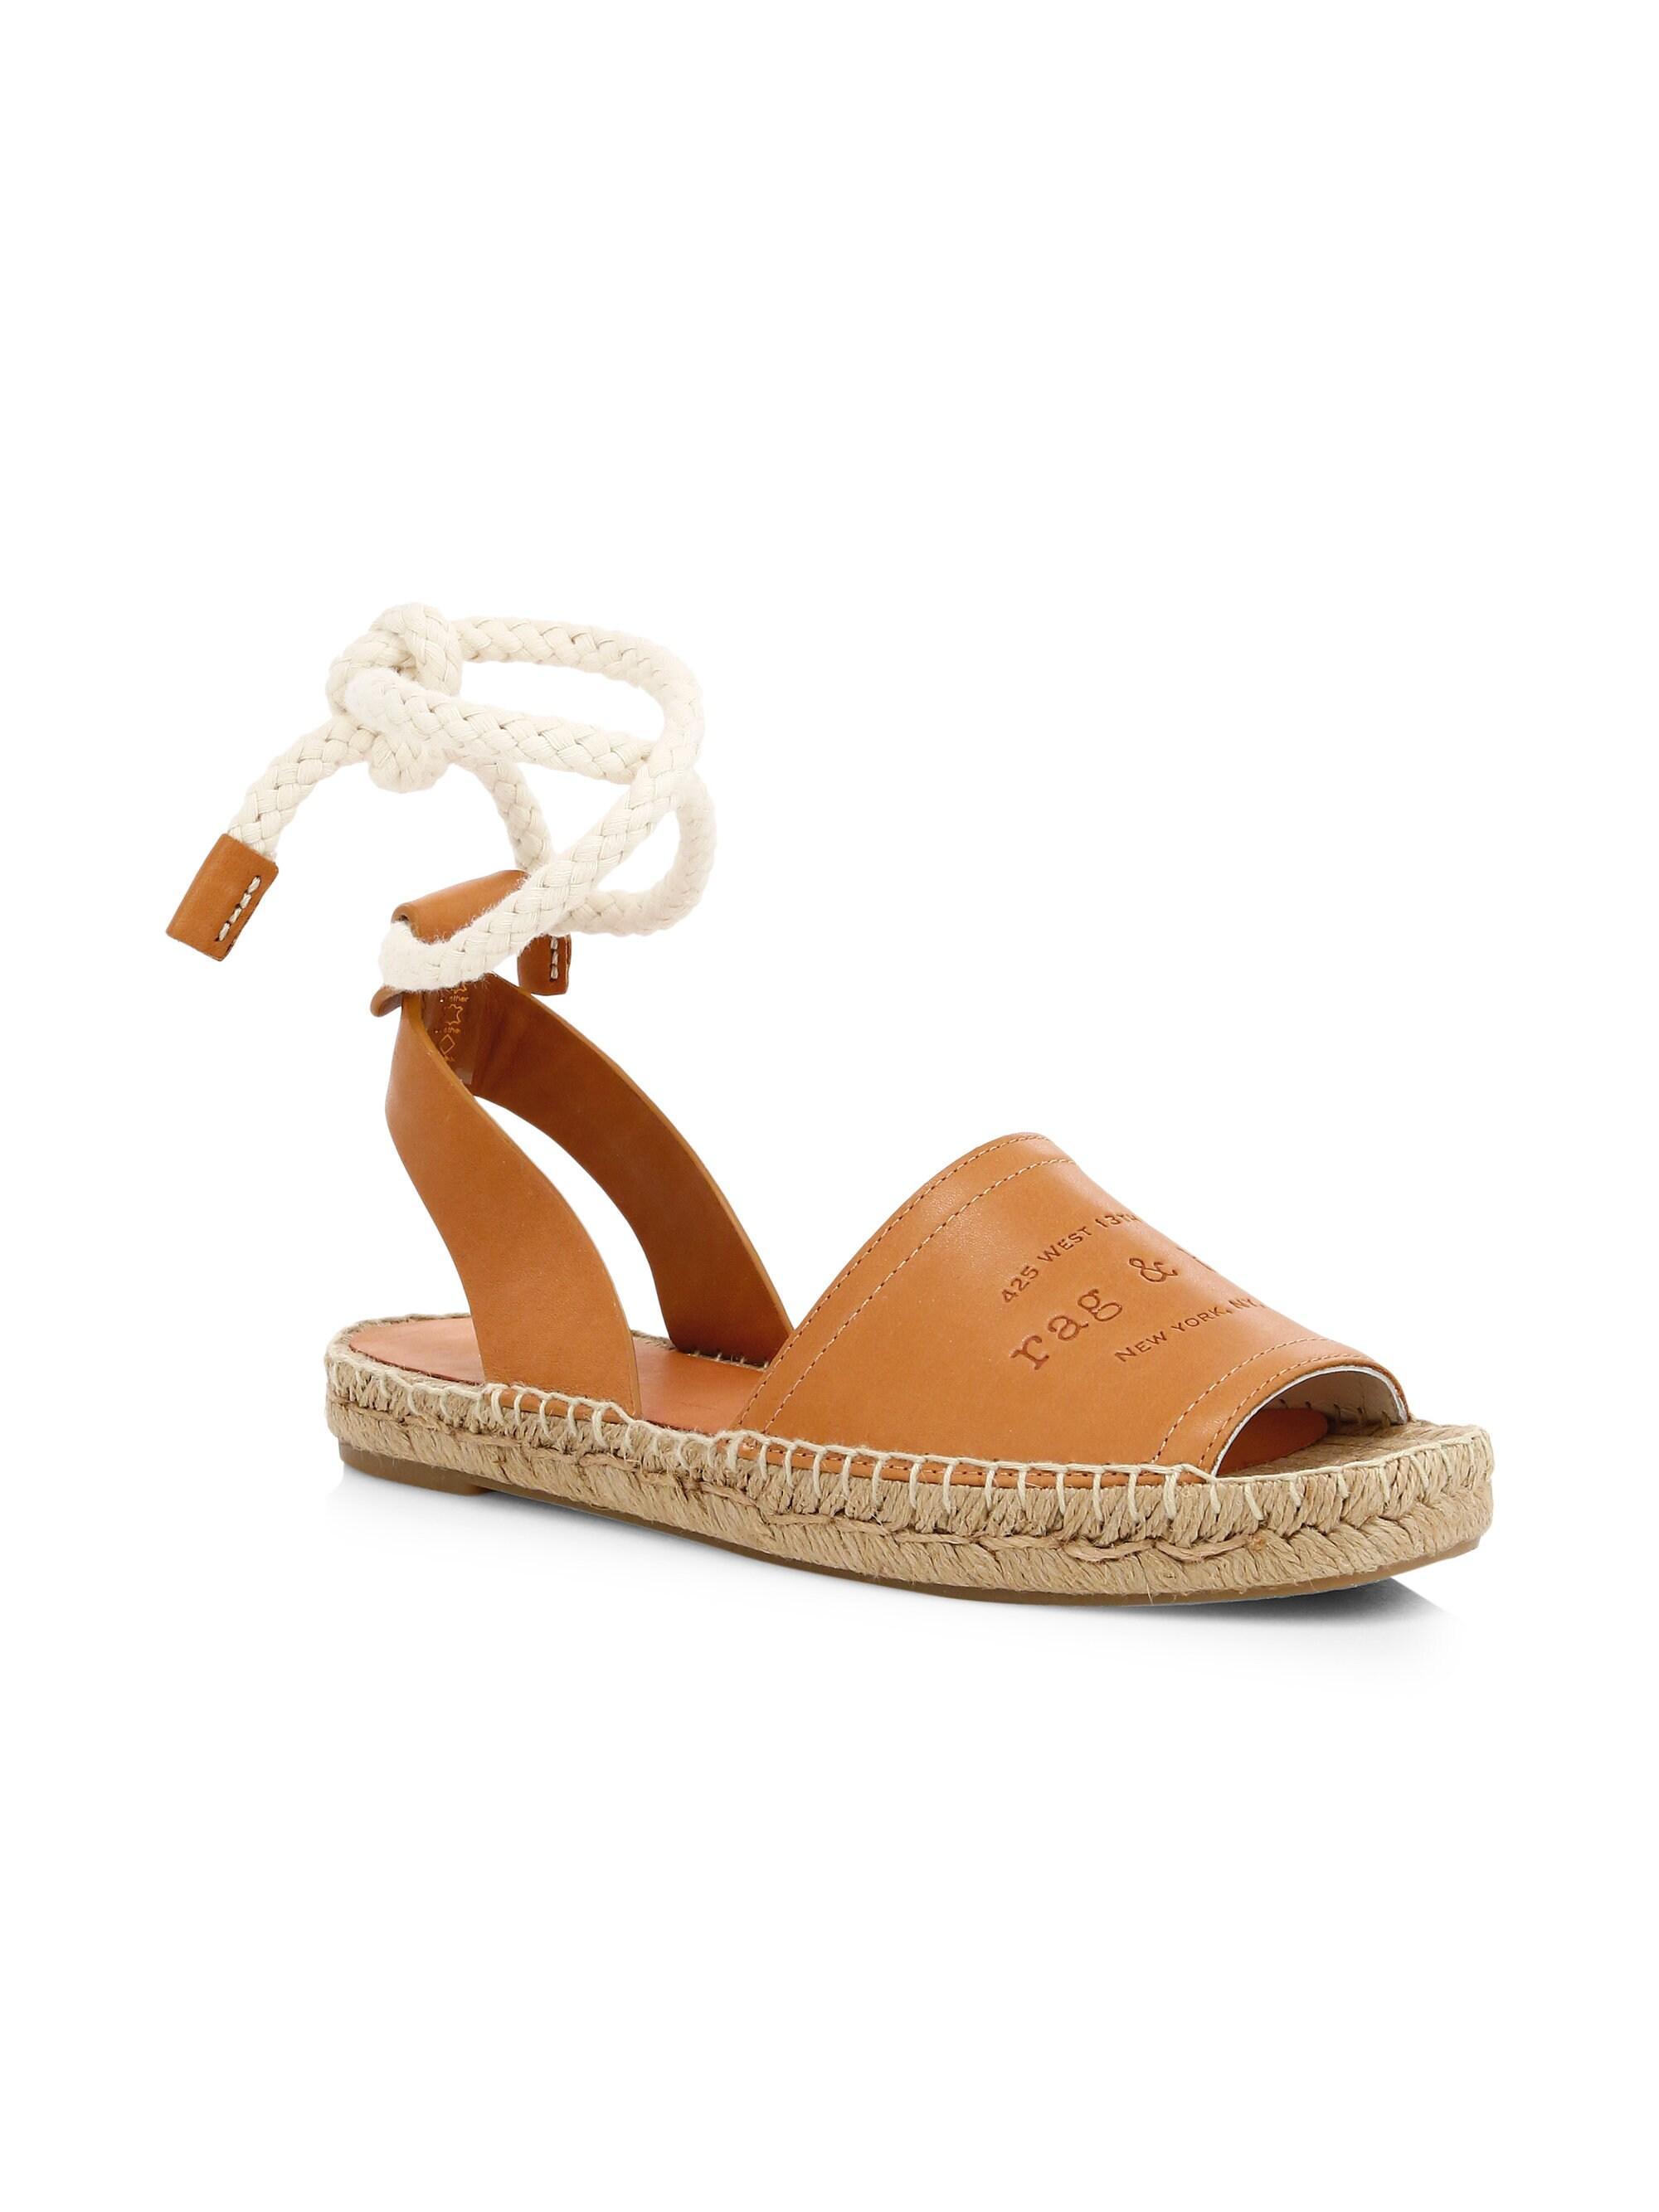 2075c375b5c Rag & Bone Women's Estelle Leather Espadrille Slingback Sandals ...